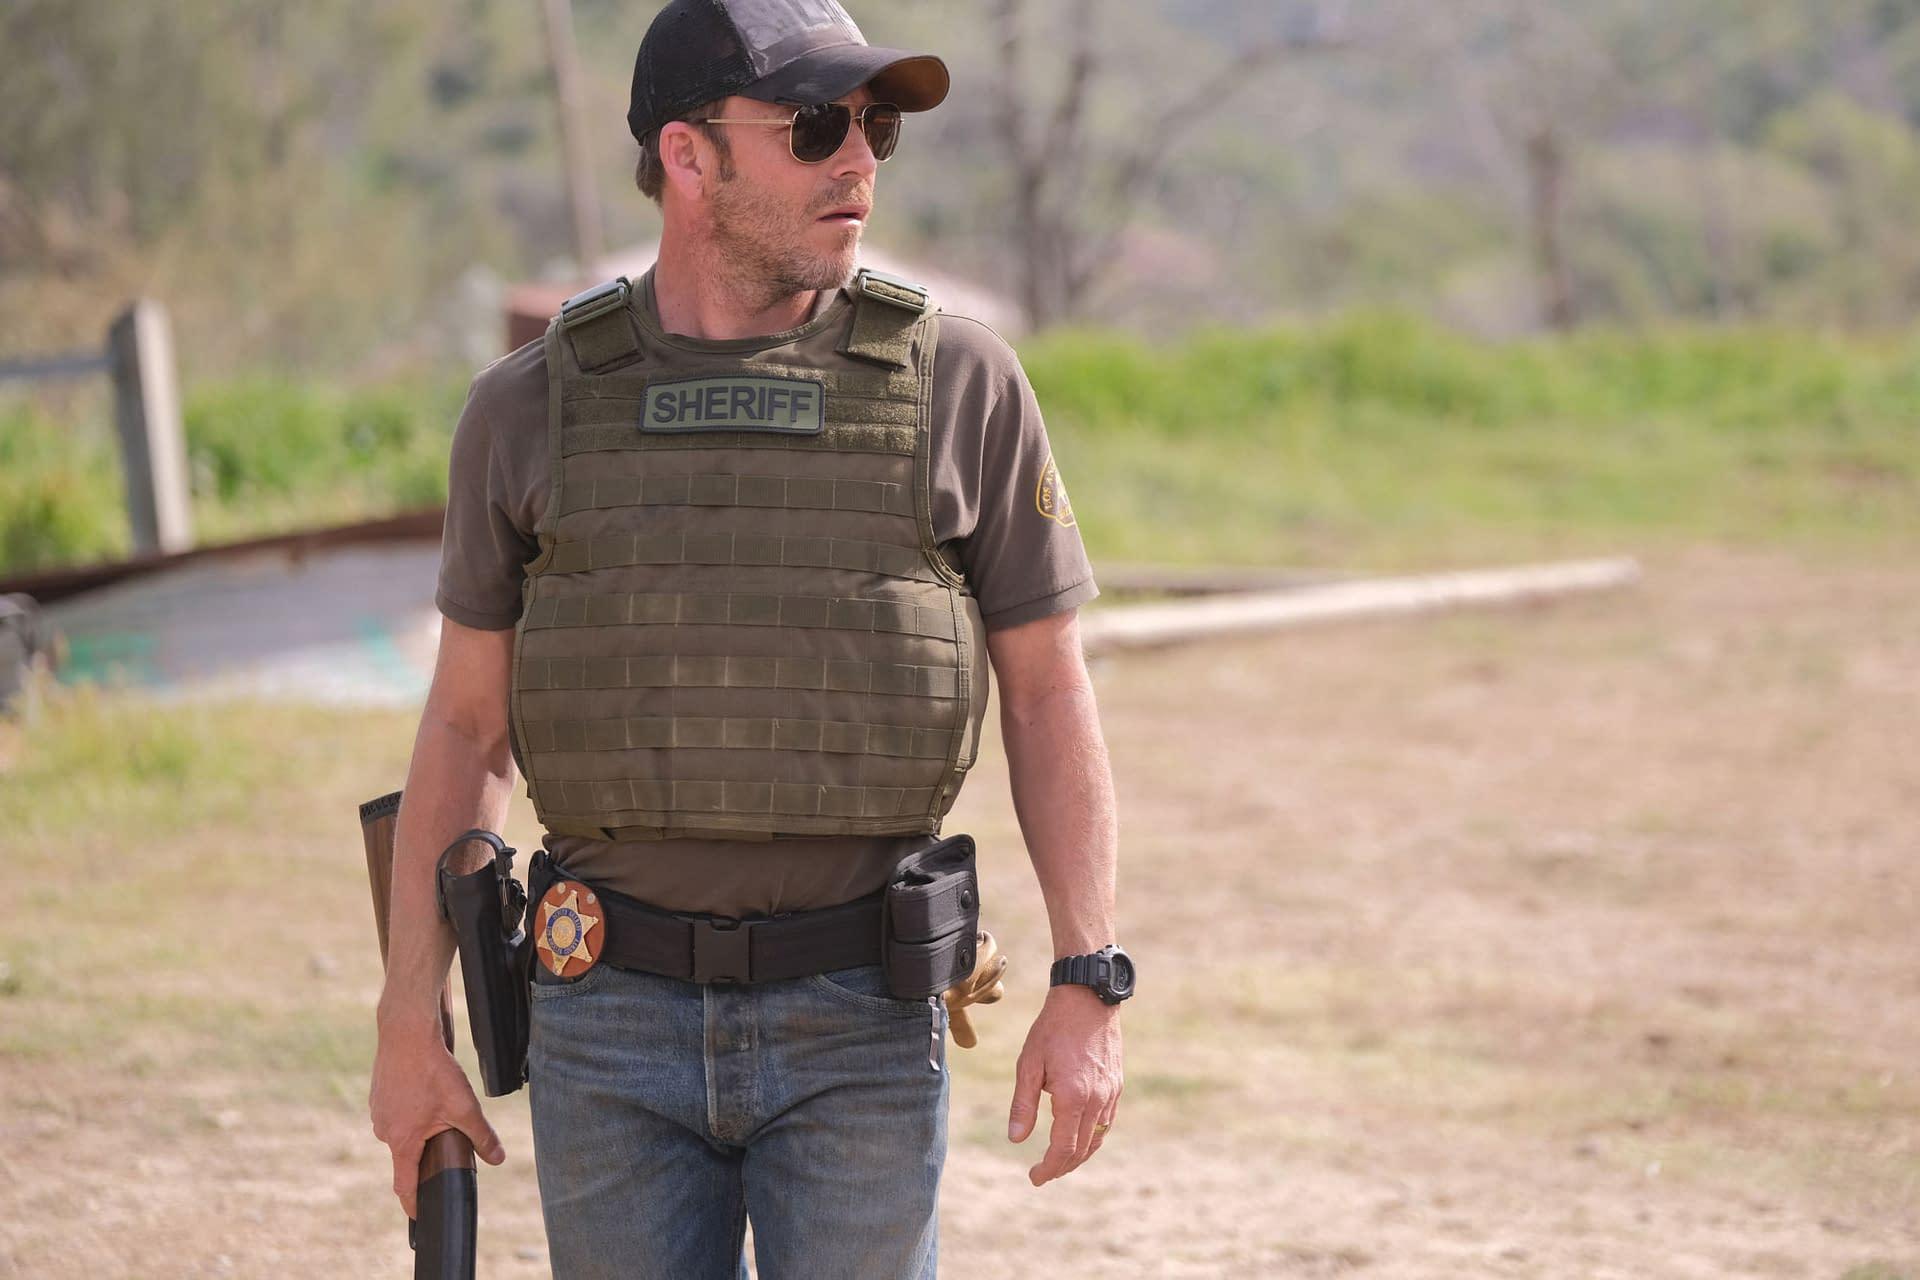 FOX Greenlights Tom Payne's 'Prodigal Son,' Stephen Dorff's 'Deputy,' AI Drama 'neXt' and More